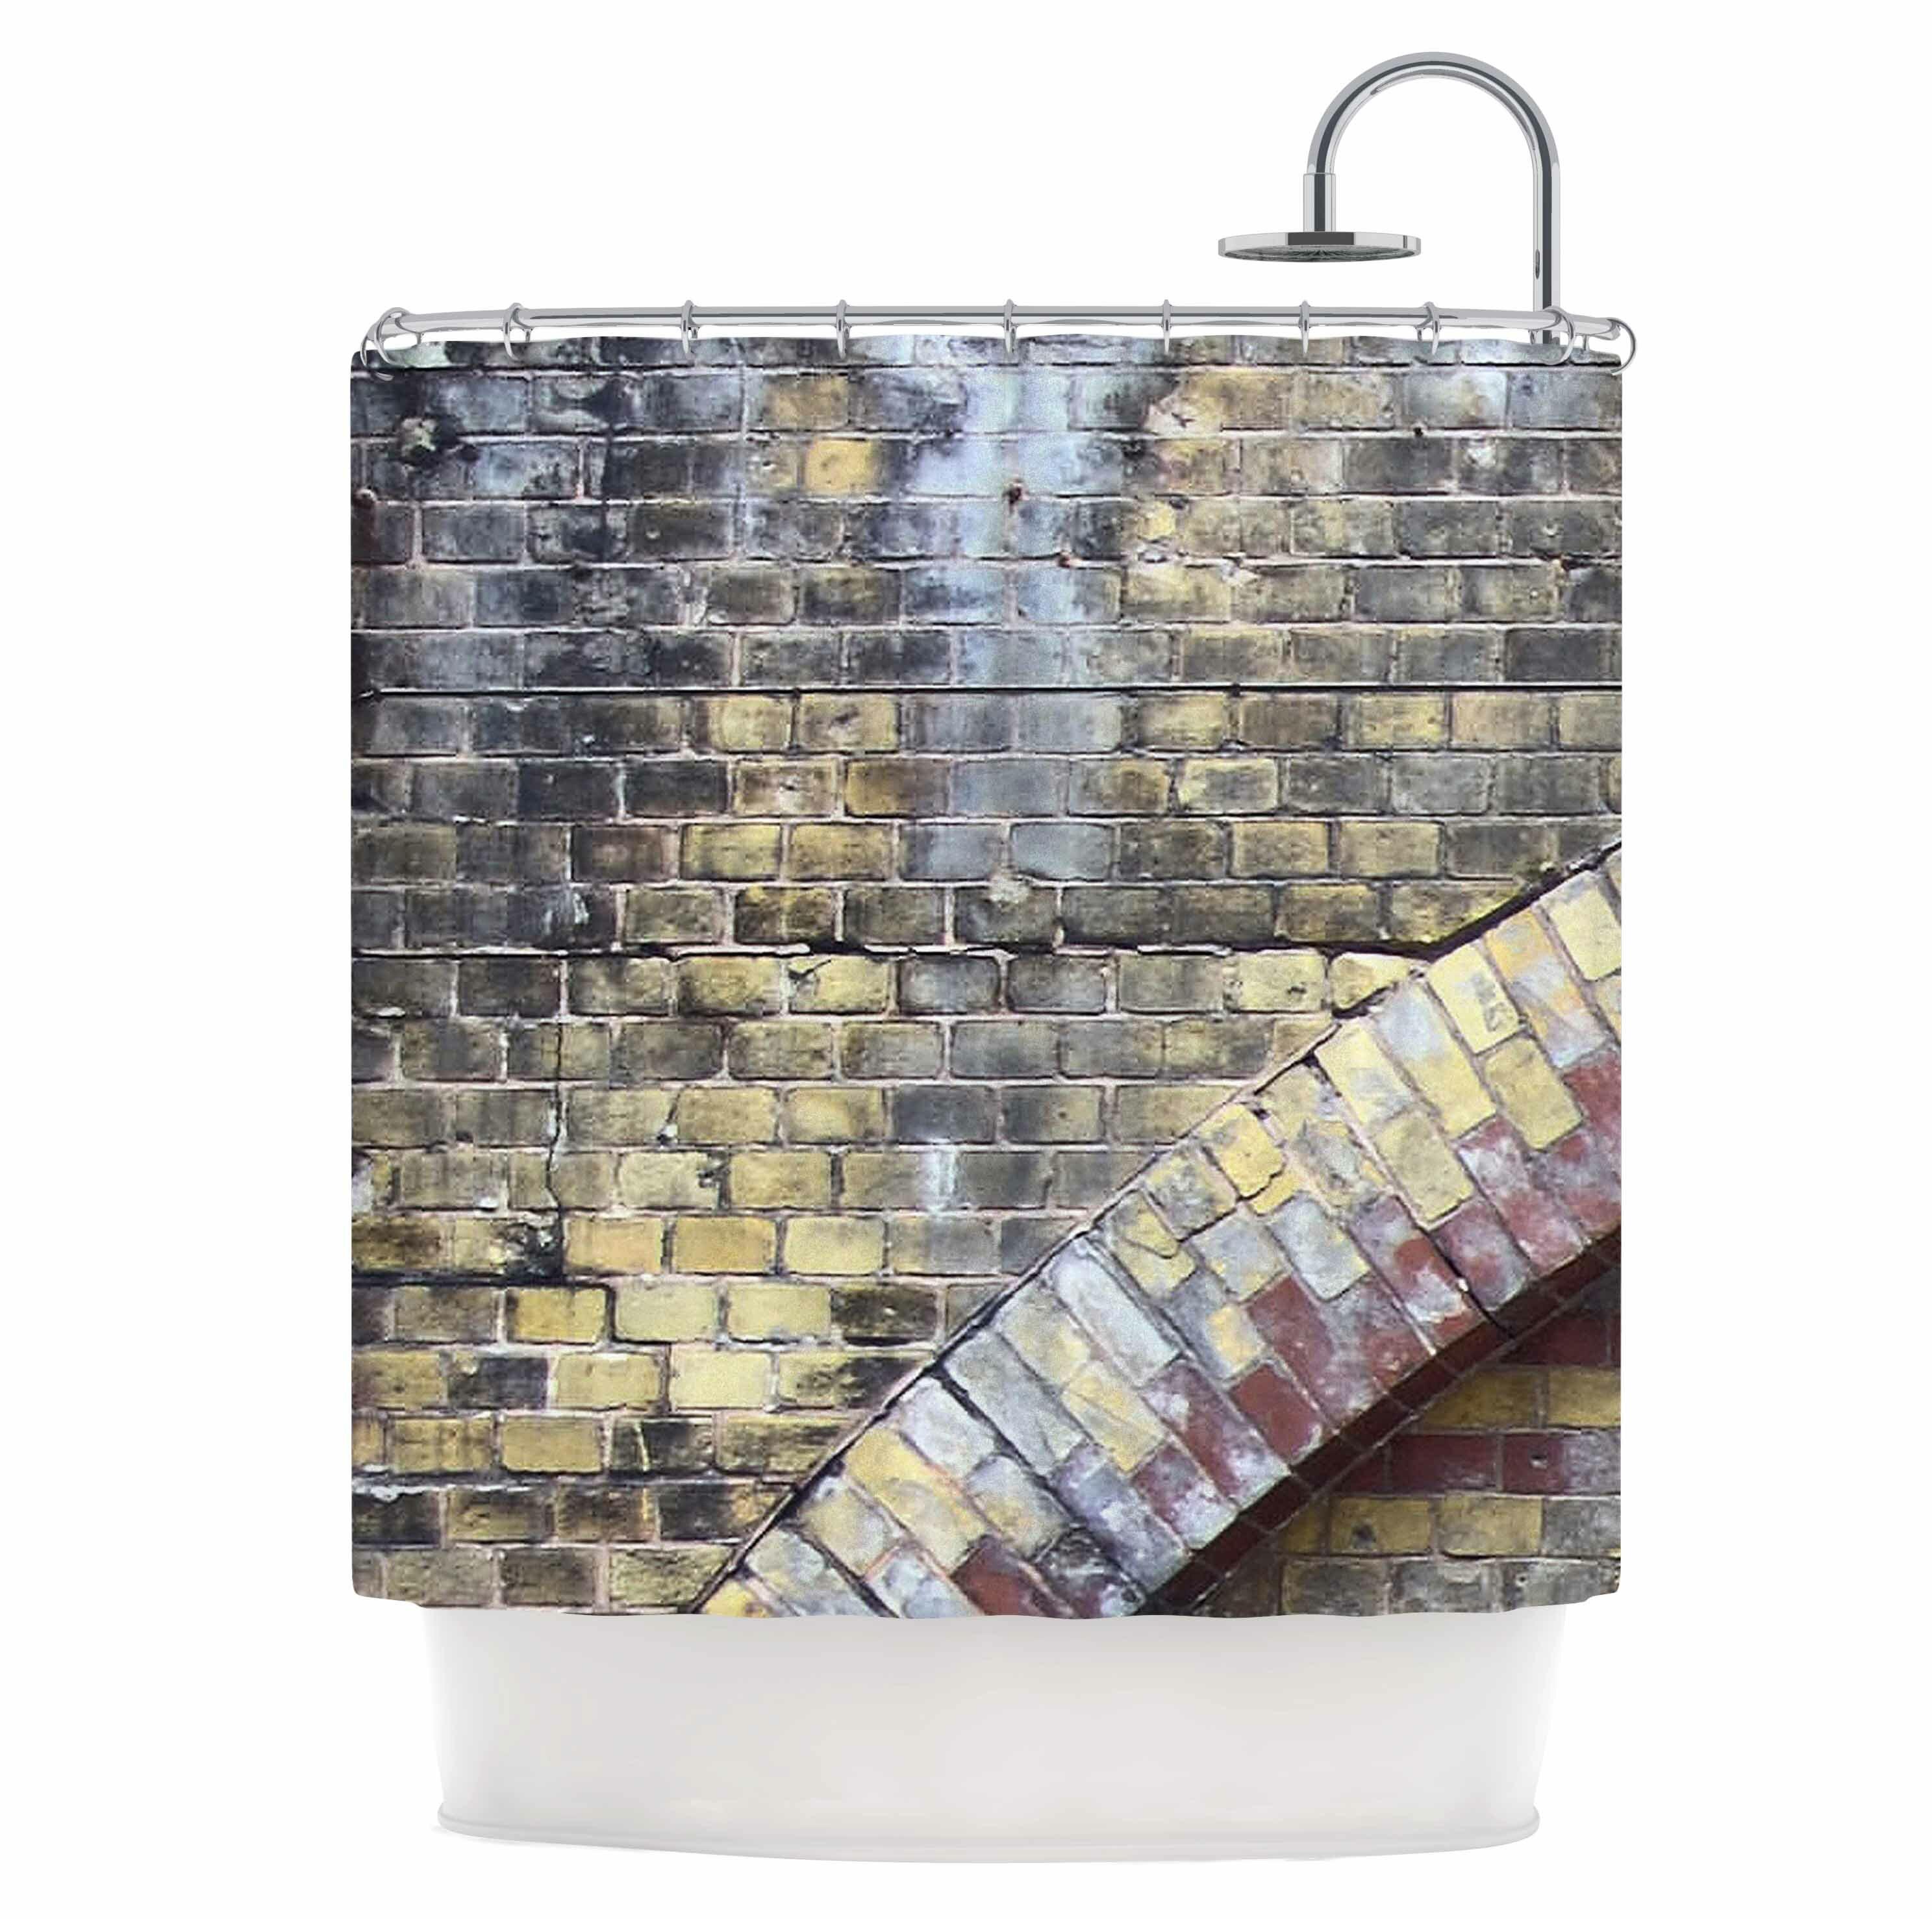 East Urban Home Grunge Brick Wall Shower Curtain